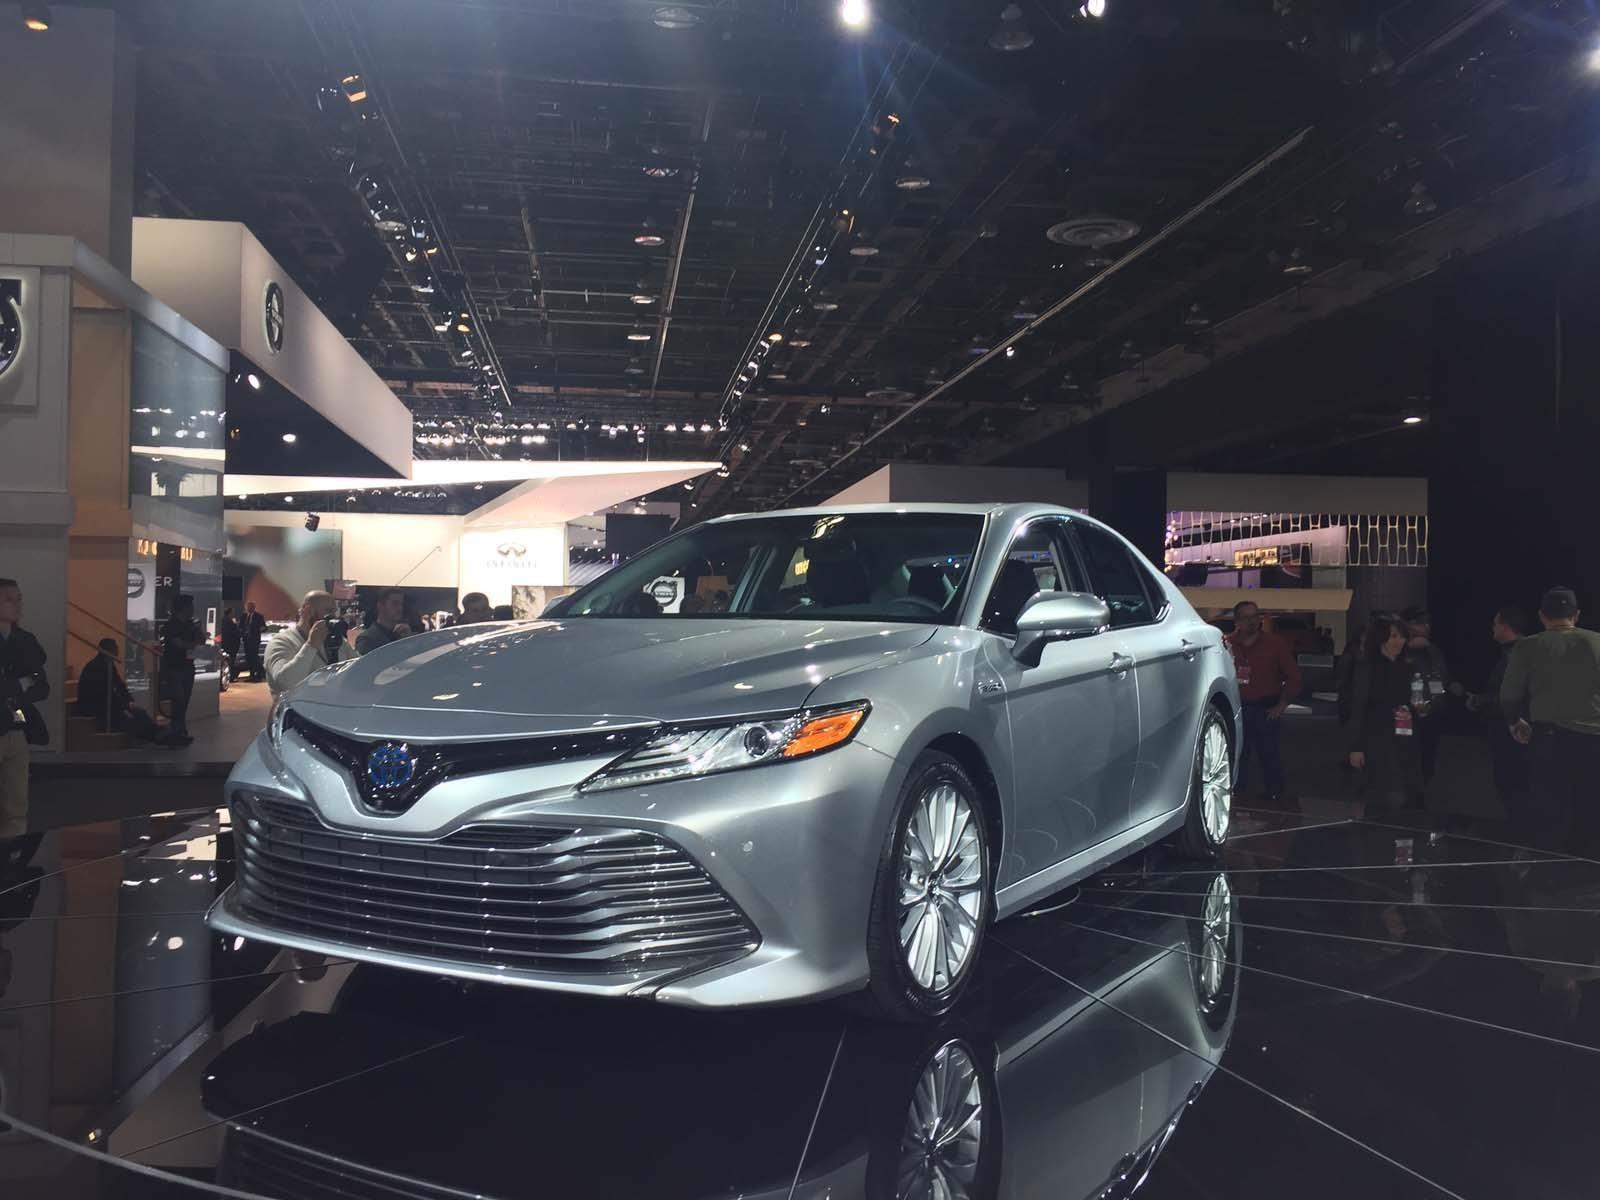 Toyota Camry 2018 Llega A M 233 Xico Desde 409 900 Pesos